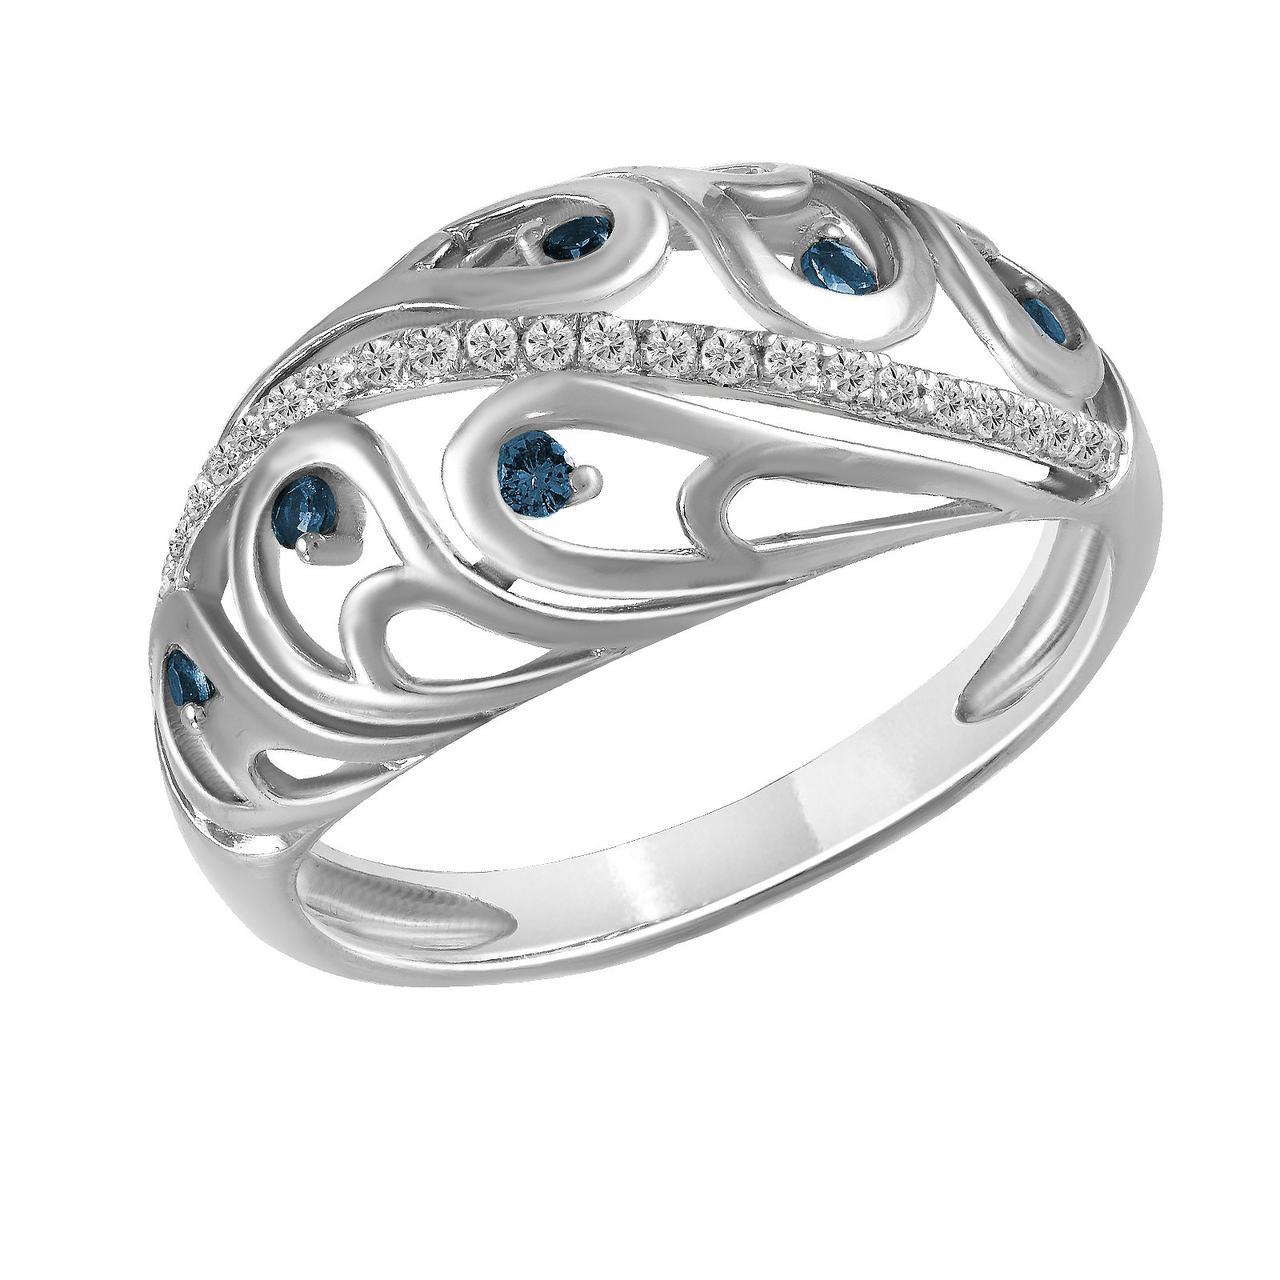 Золотое кольцо с бриллиантами и сапфирами, размер 16.5 (1512207)